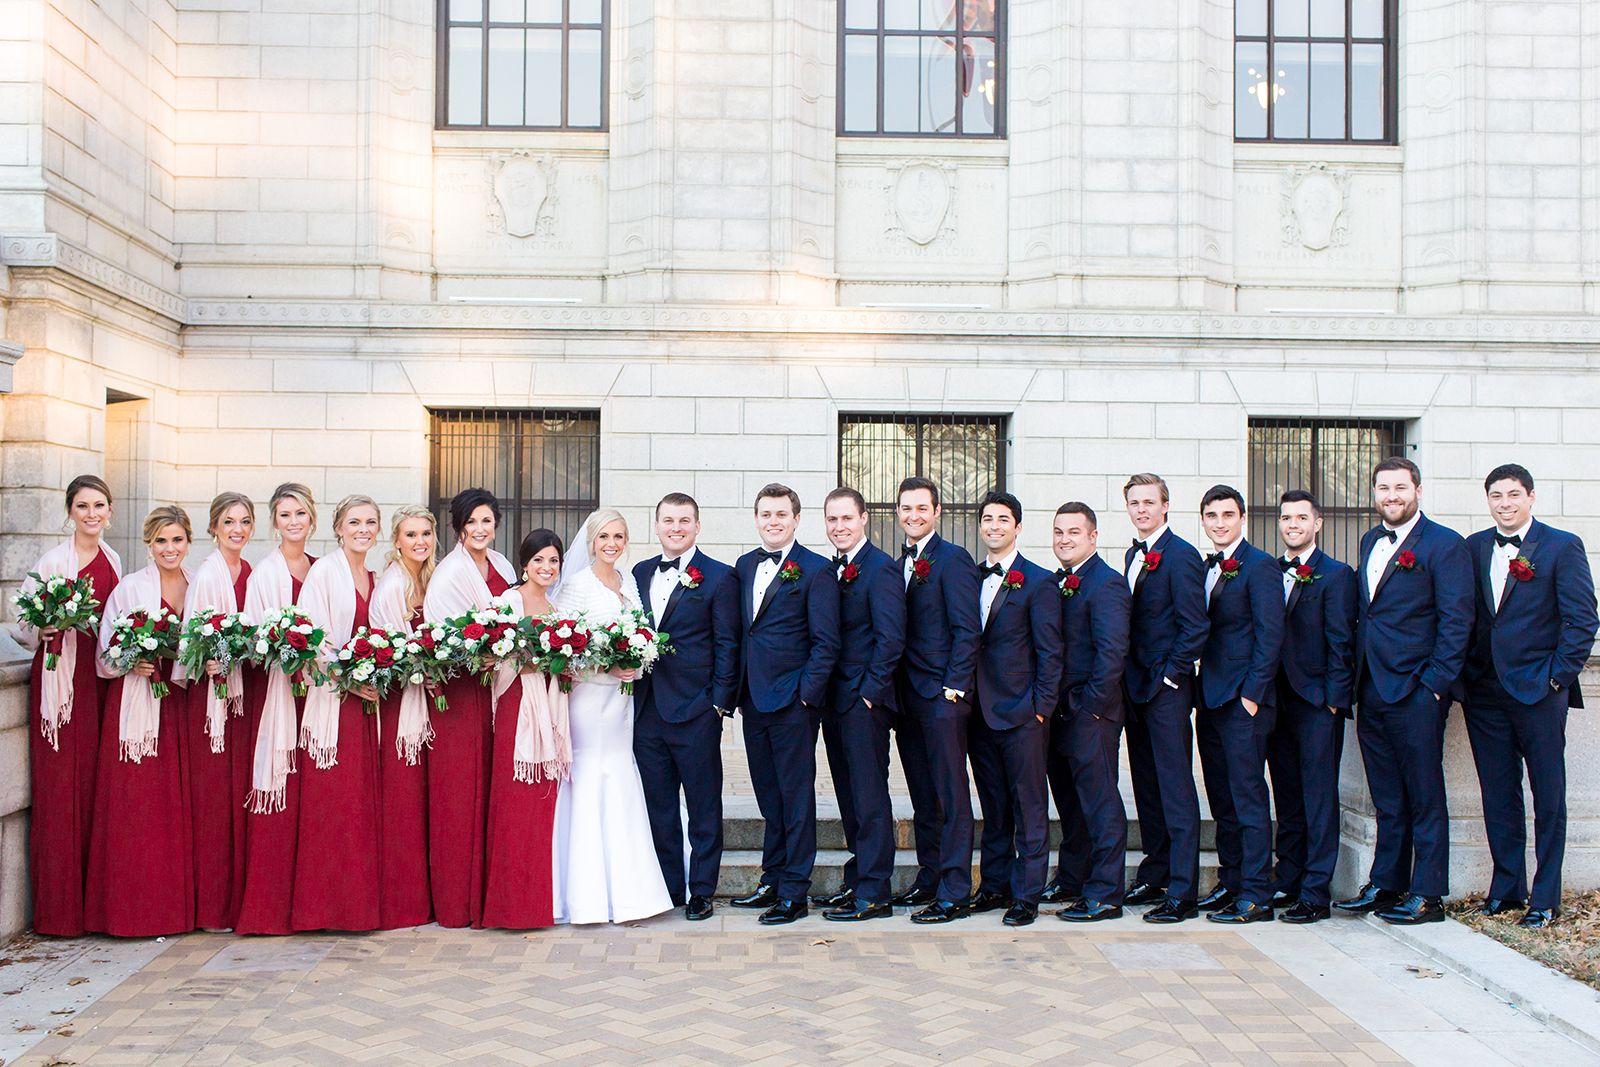 Laura Ann Miller Caramel Room Wedding St Louis Mo Wedding Portraits Bride And Groom Photo Floral Arrangement Winter Wedd Wedding Wedding Gowns Wedding Vendors